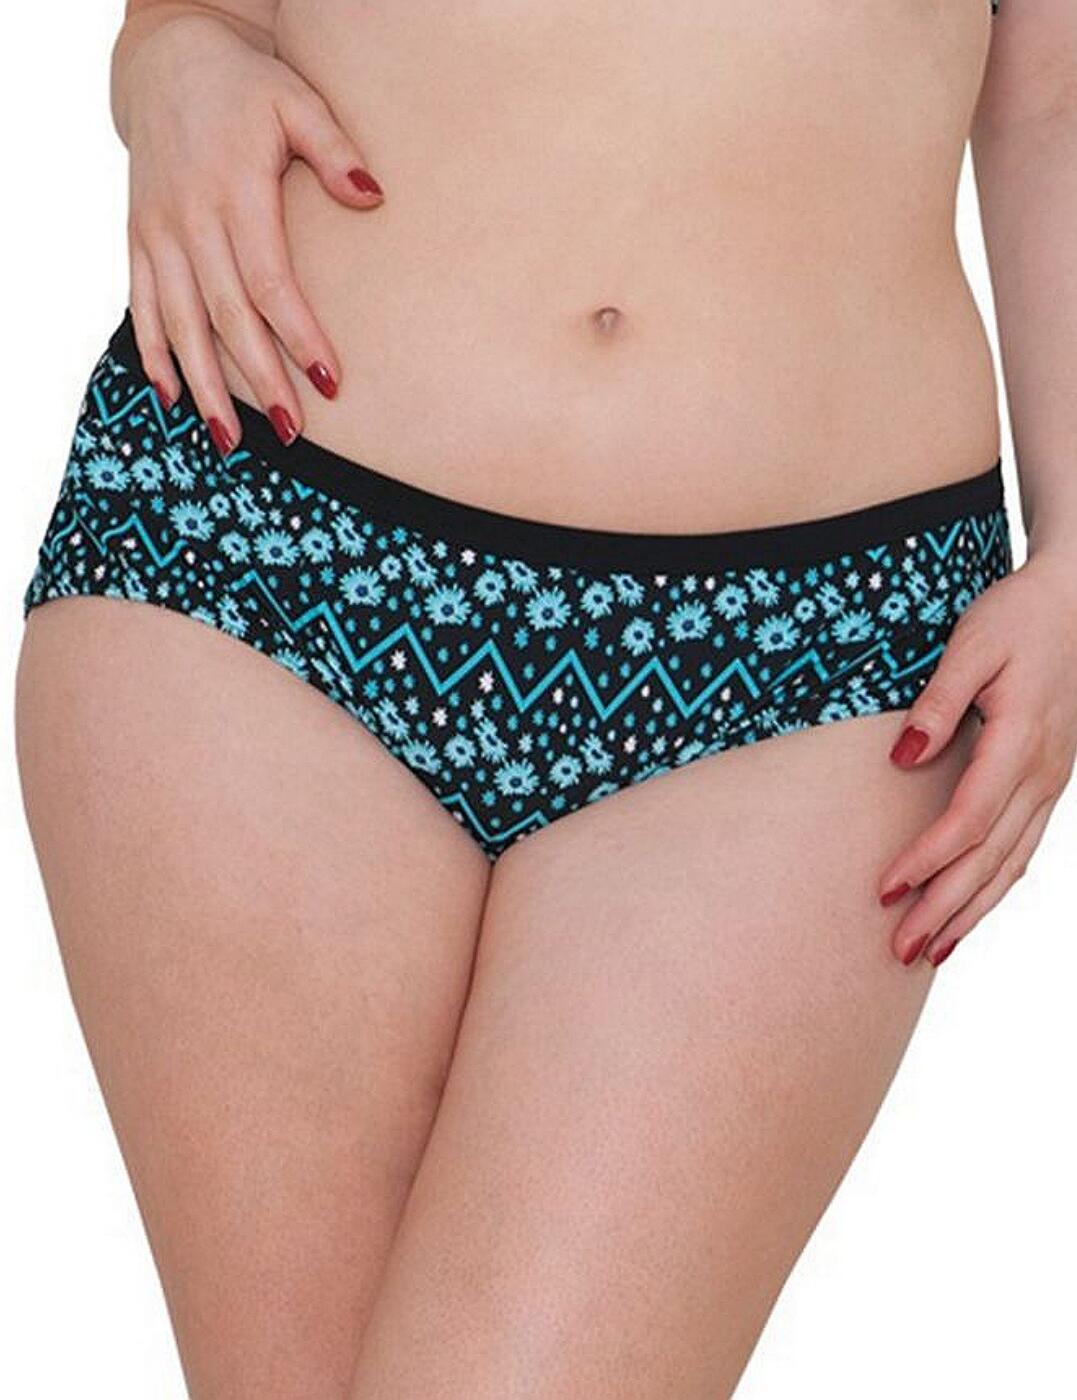 CS3803 Curvy Kate Reflex Bikini Short - CS3803 Floral Print